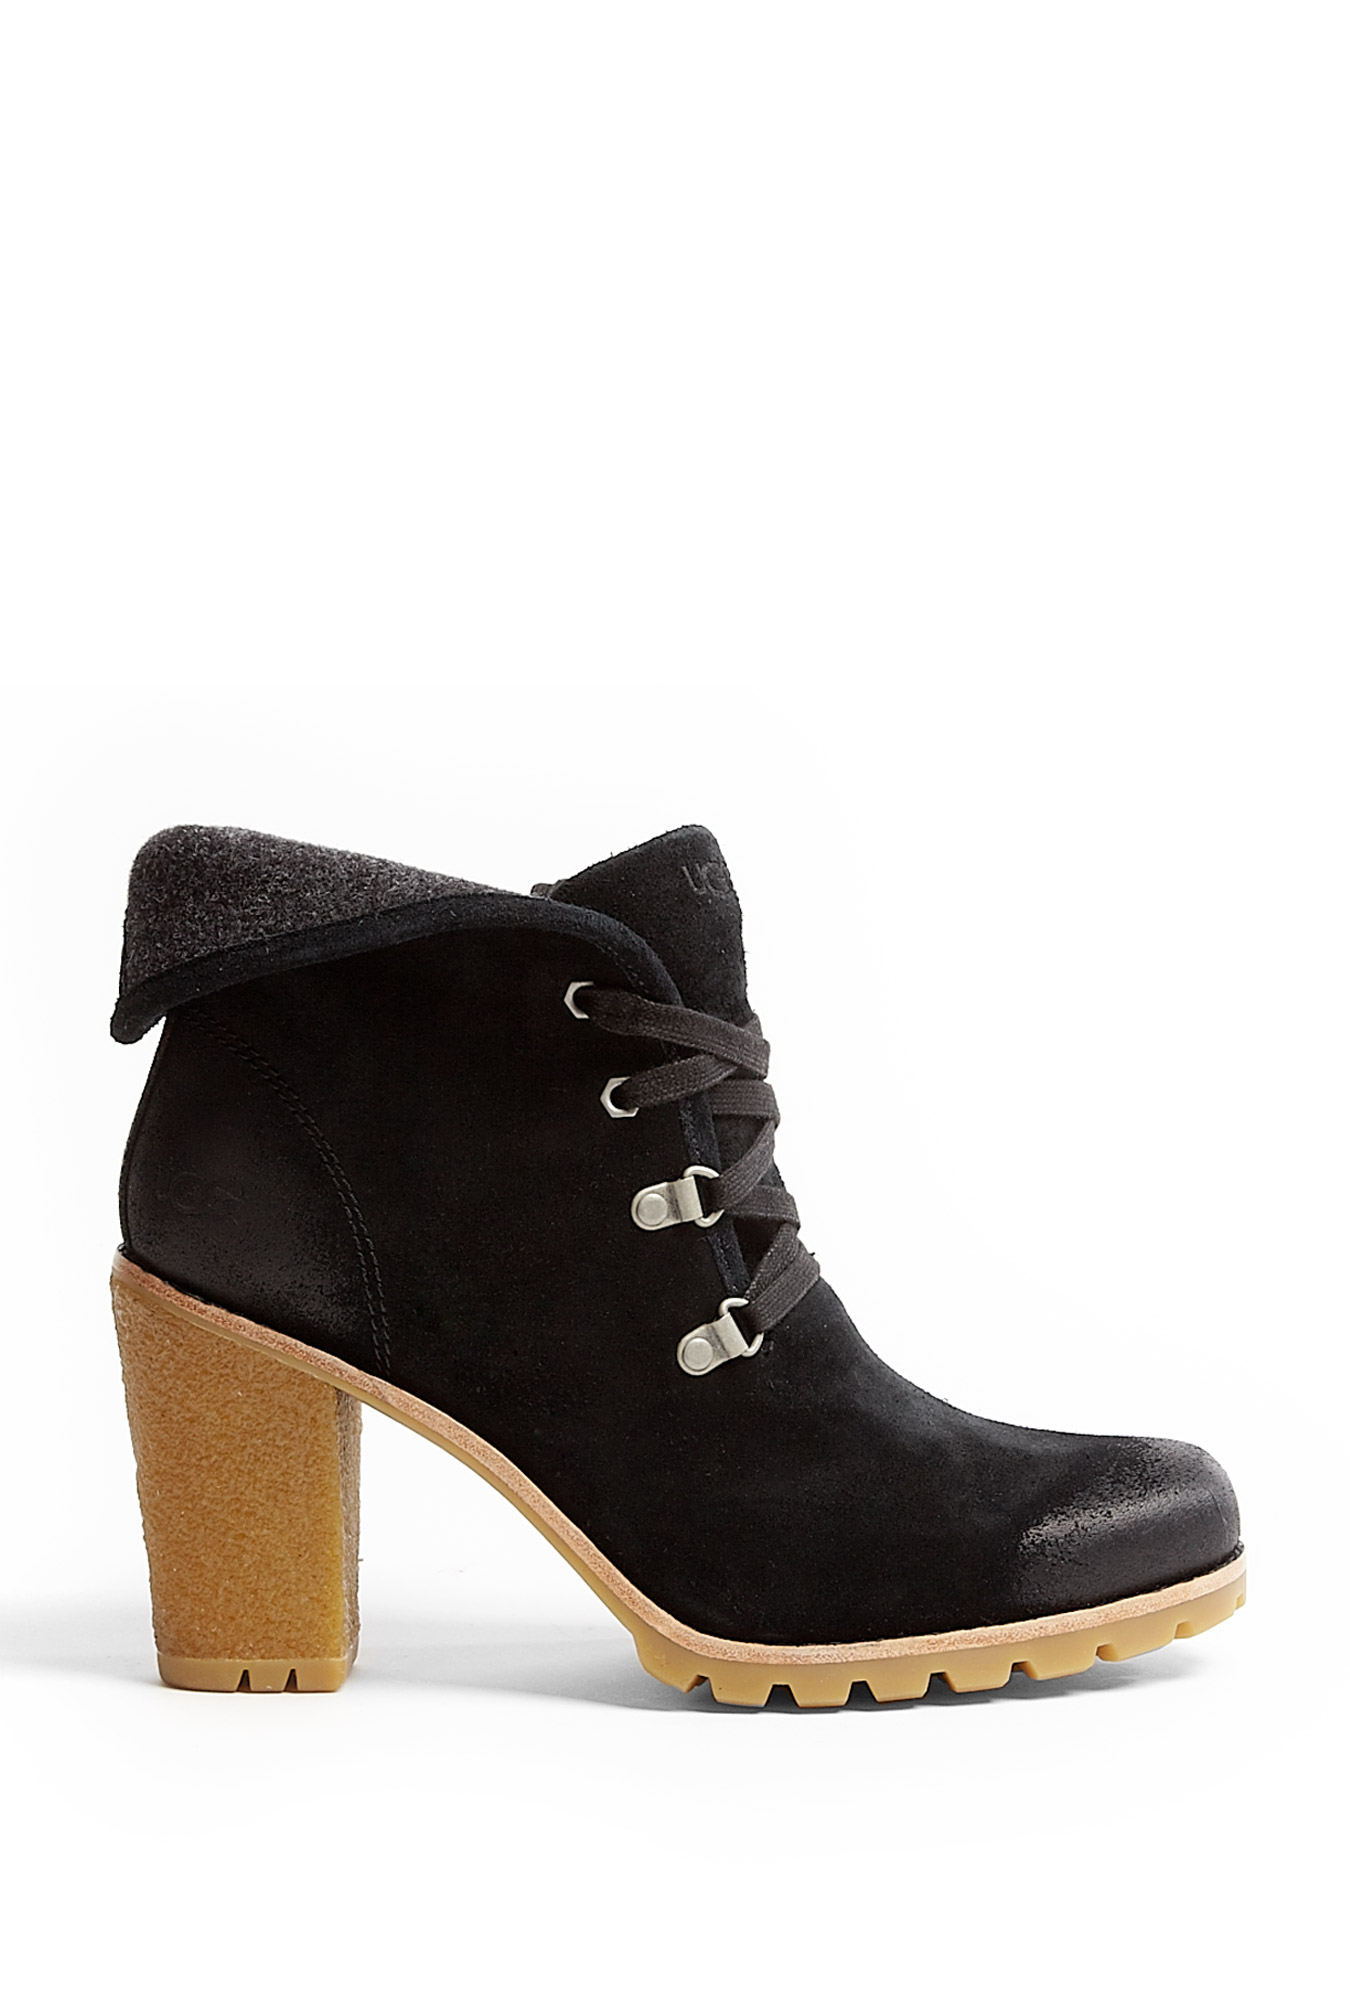 ugg black calynda suede boots in black lyst